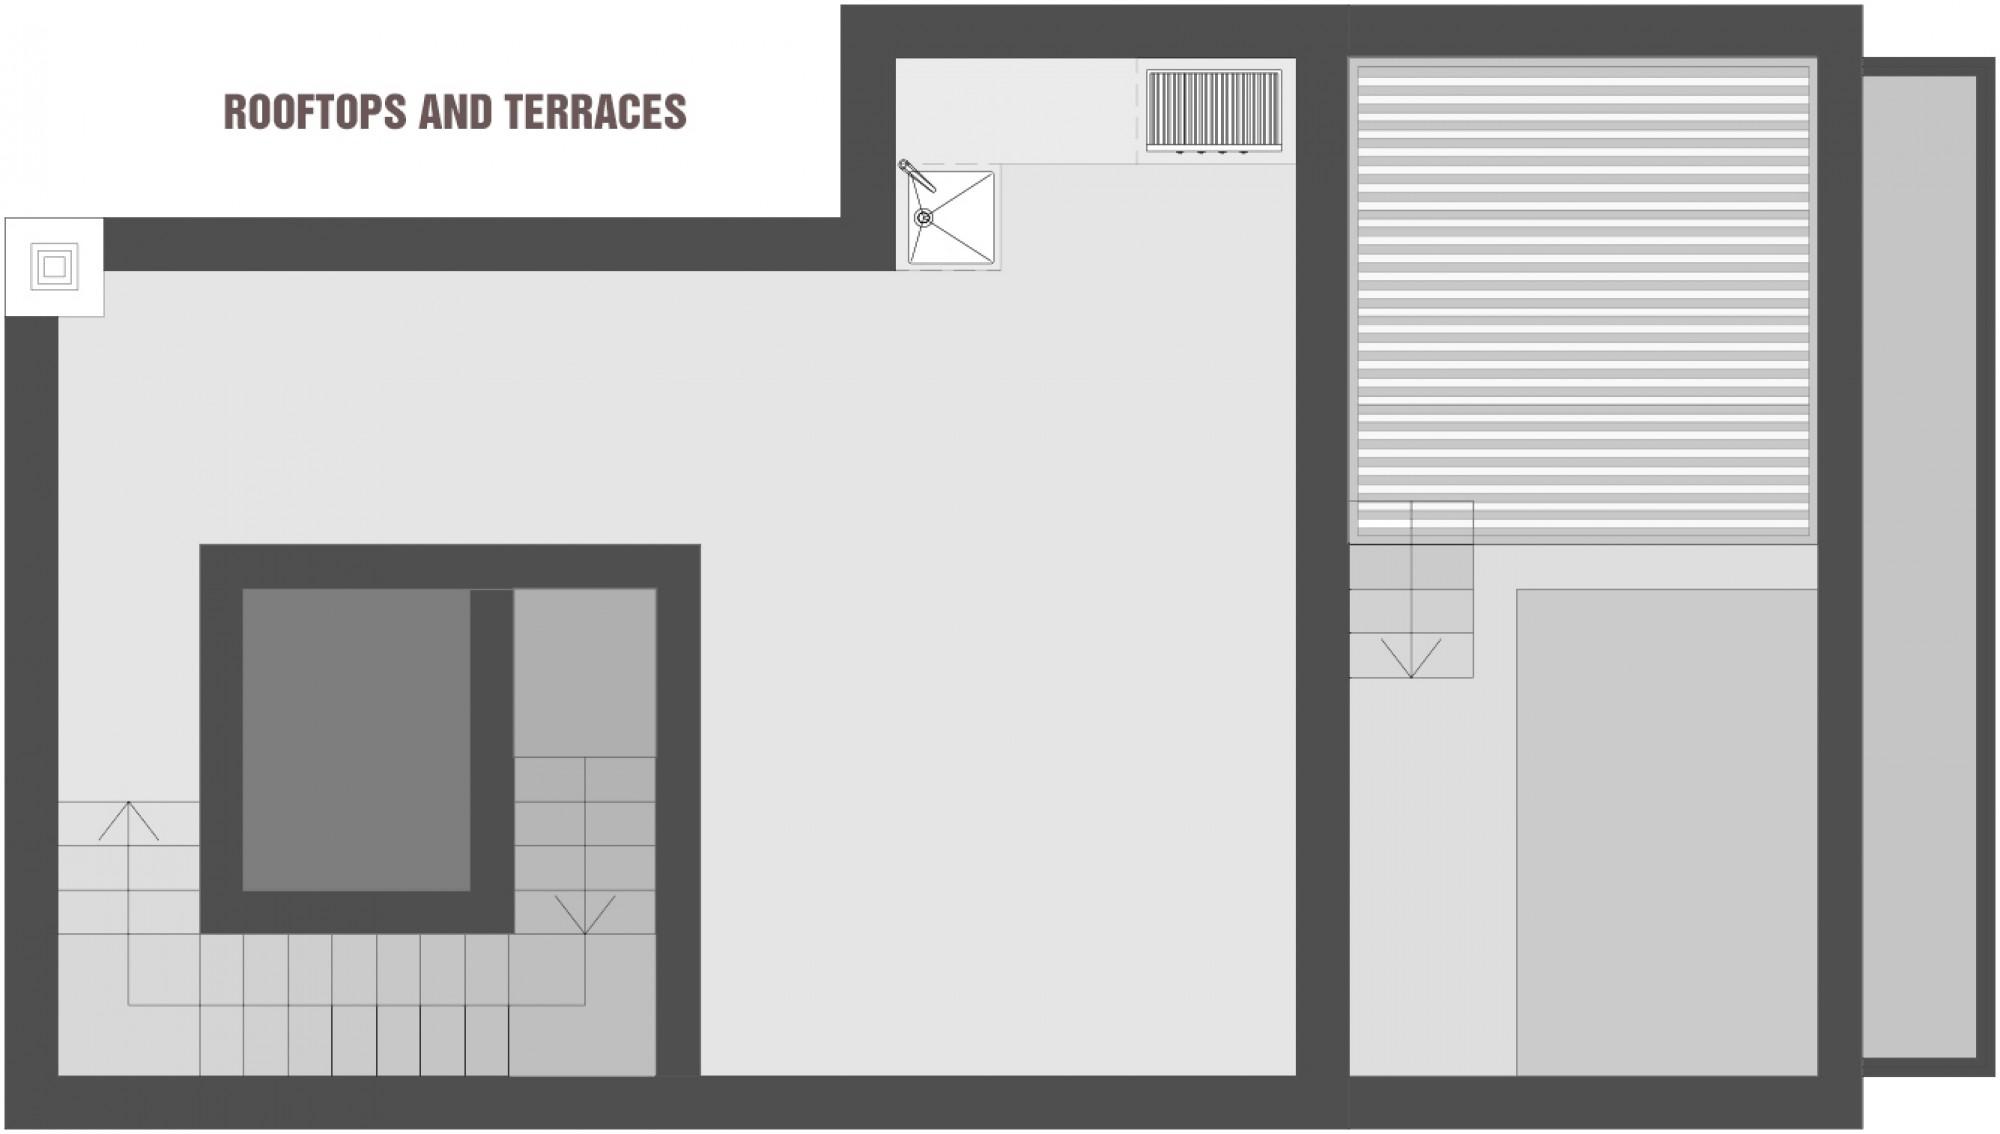 Cobertura / Rooftop